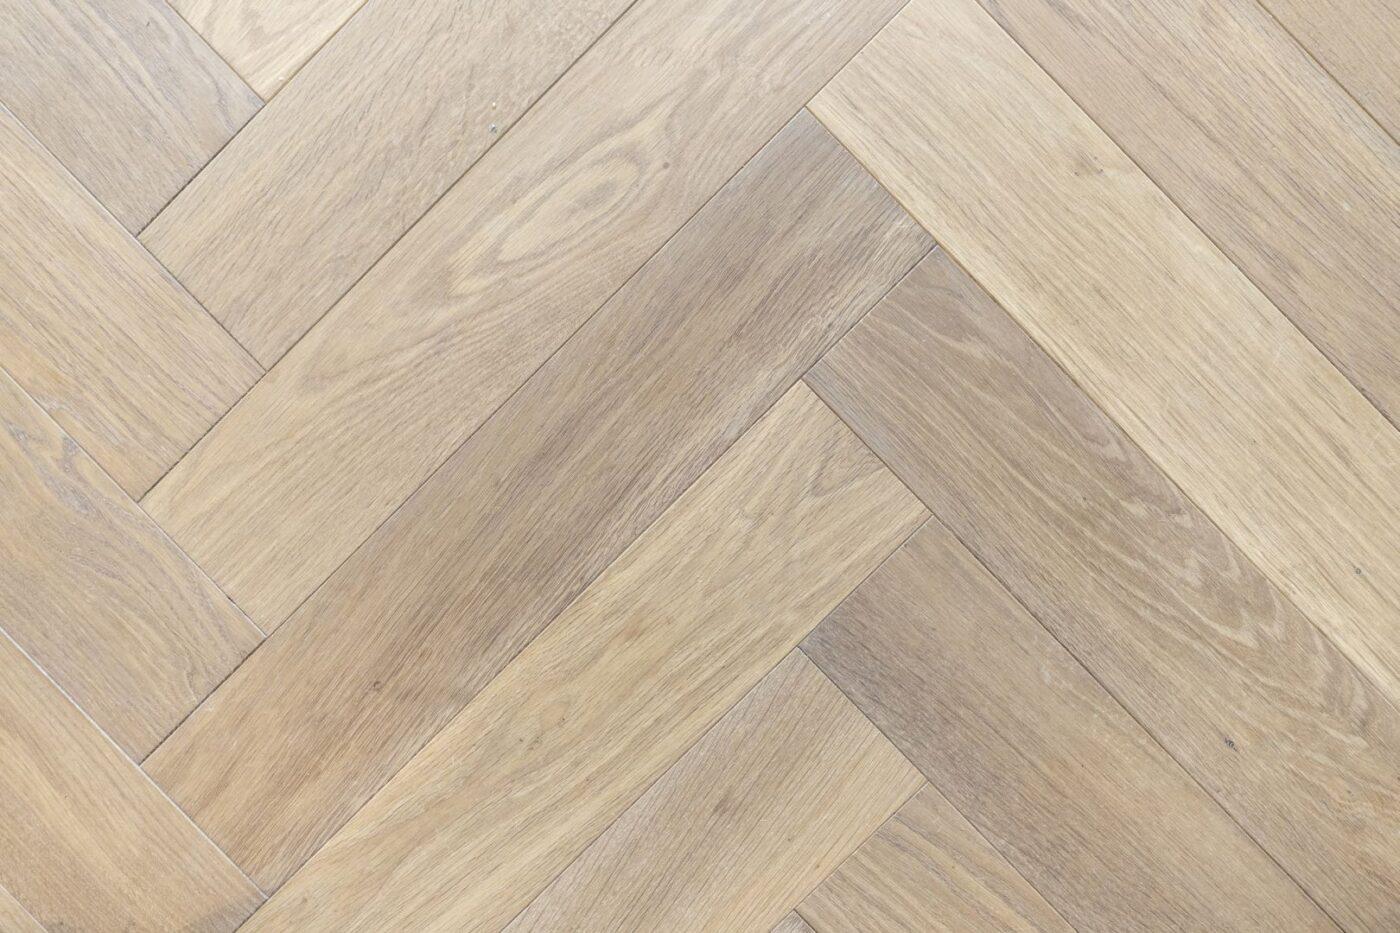 Donkere houten visgraat vloer in Bussum